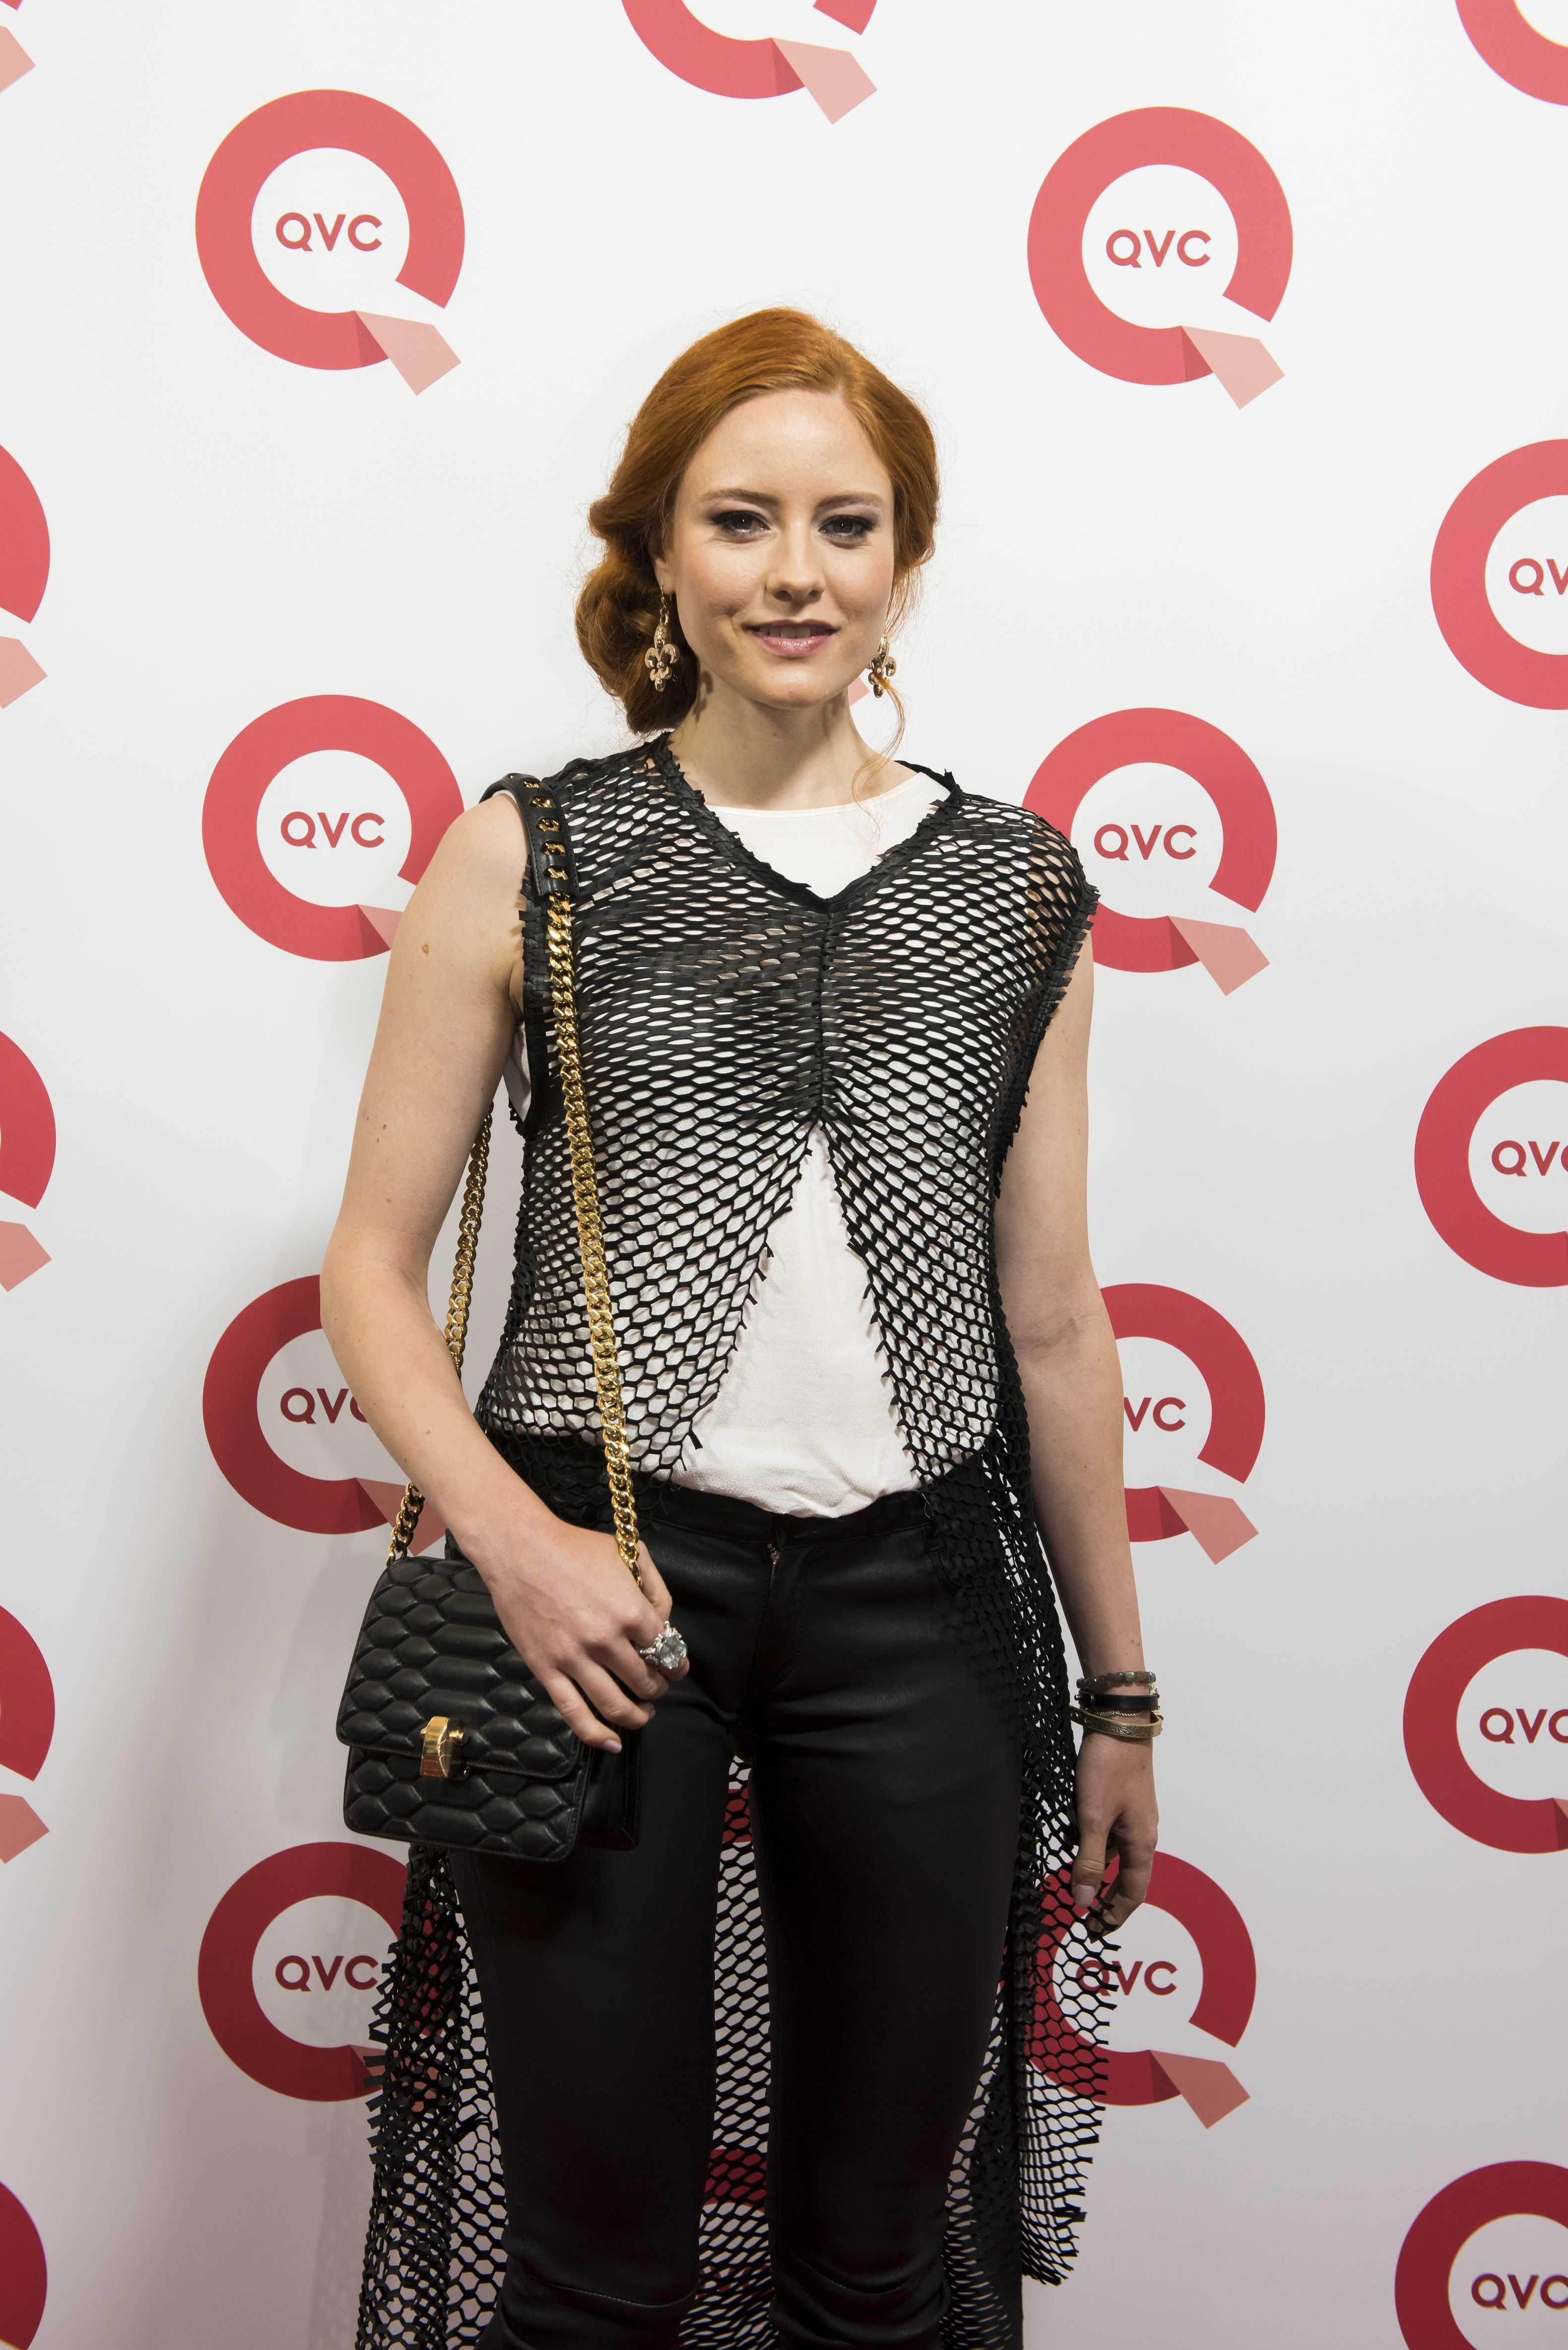 Barbara Meier at the QVC + VOGUE Fashion Night